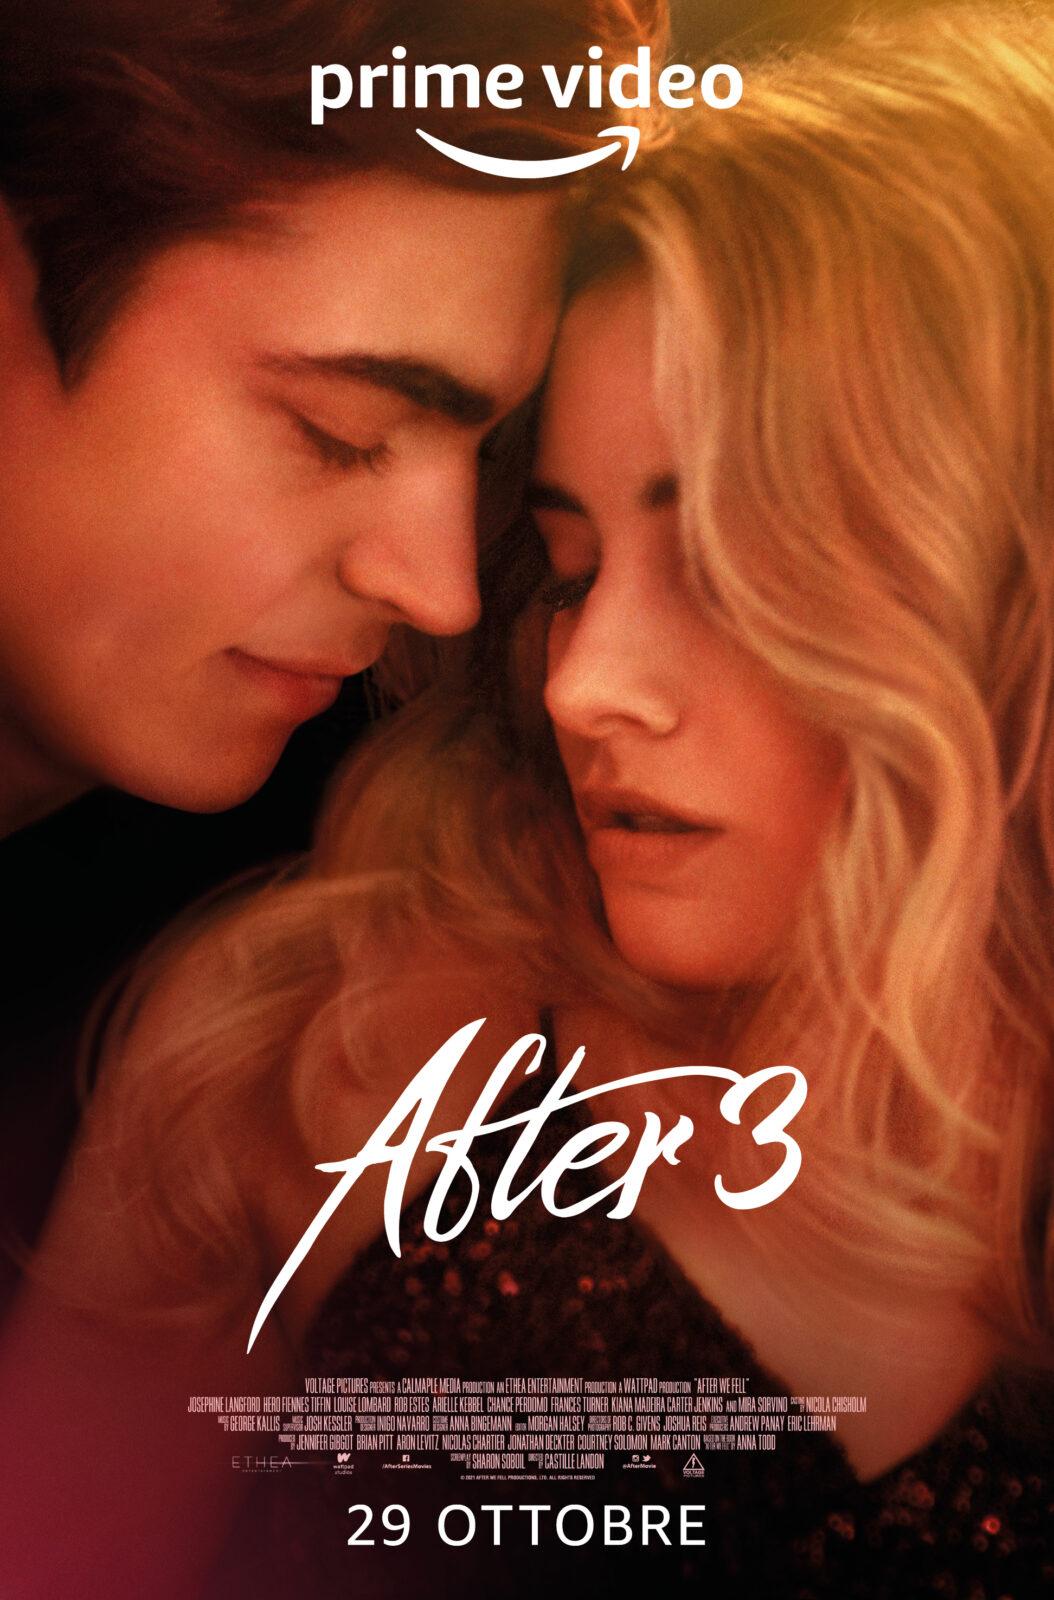 After 3, da venerdì 29 ottobre in Italia su Prime Video